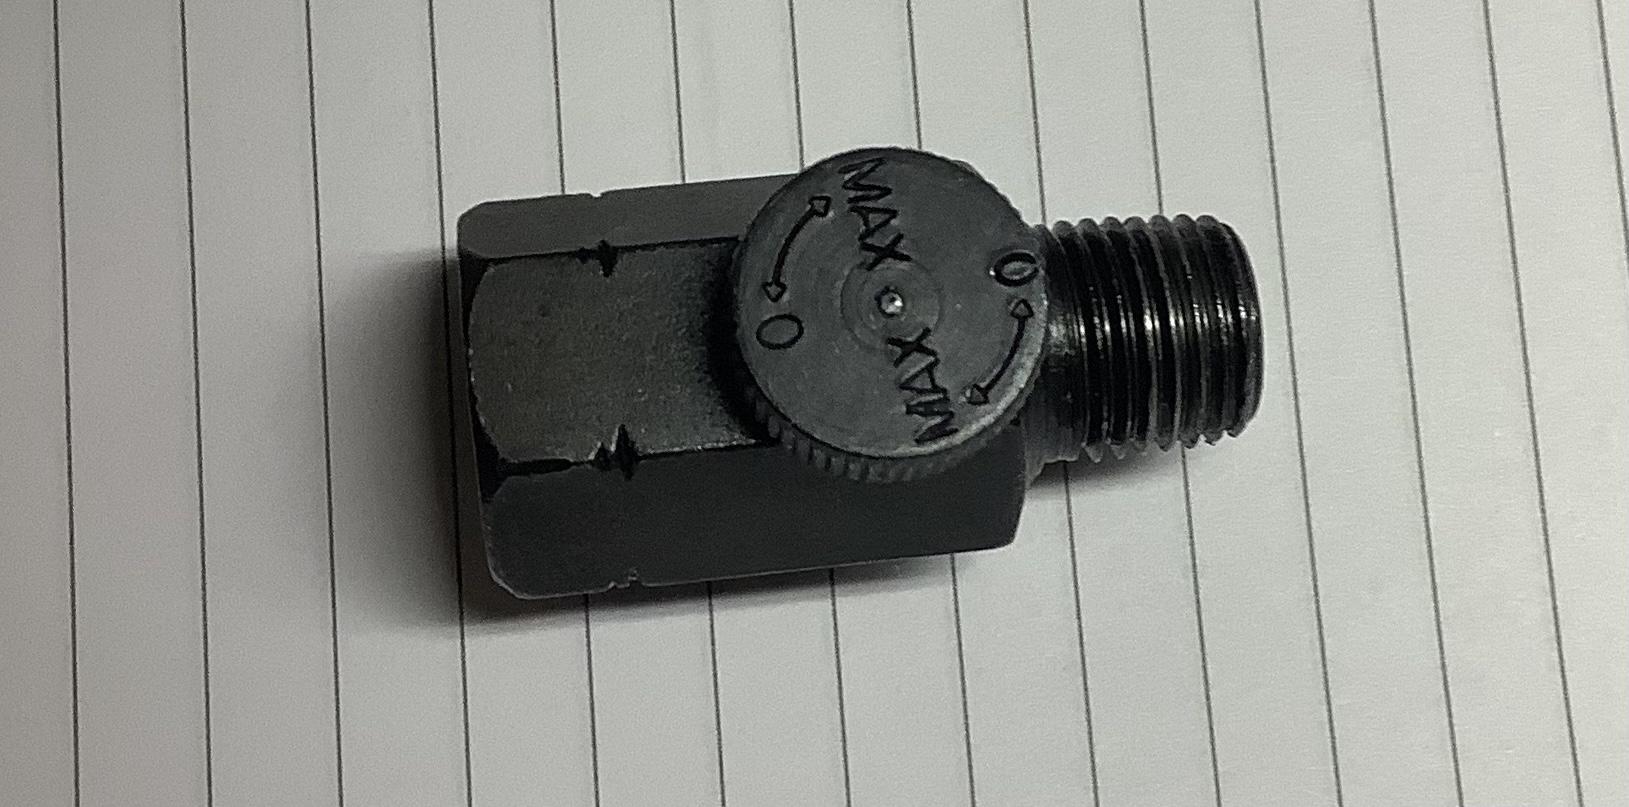 F42A4C5D-365A-4465-A73B-E0B46A0C5AFB.jpeg